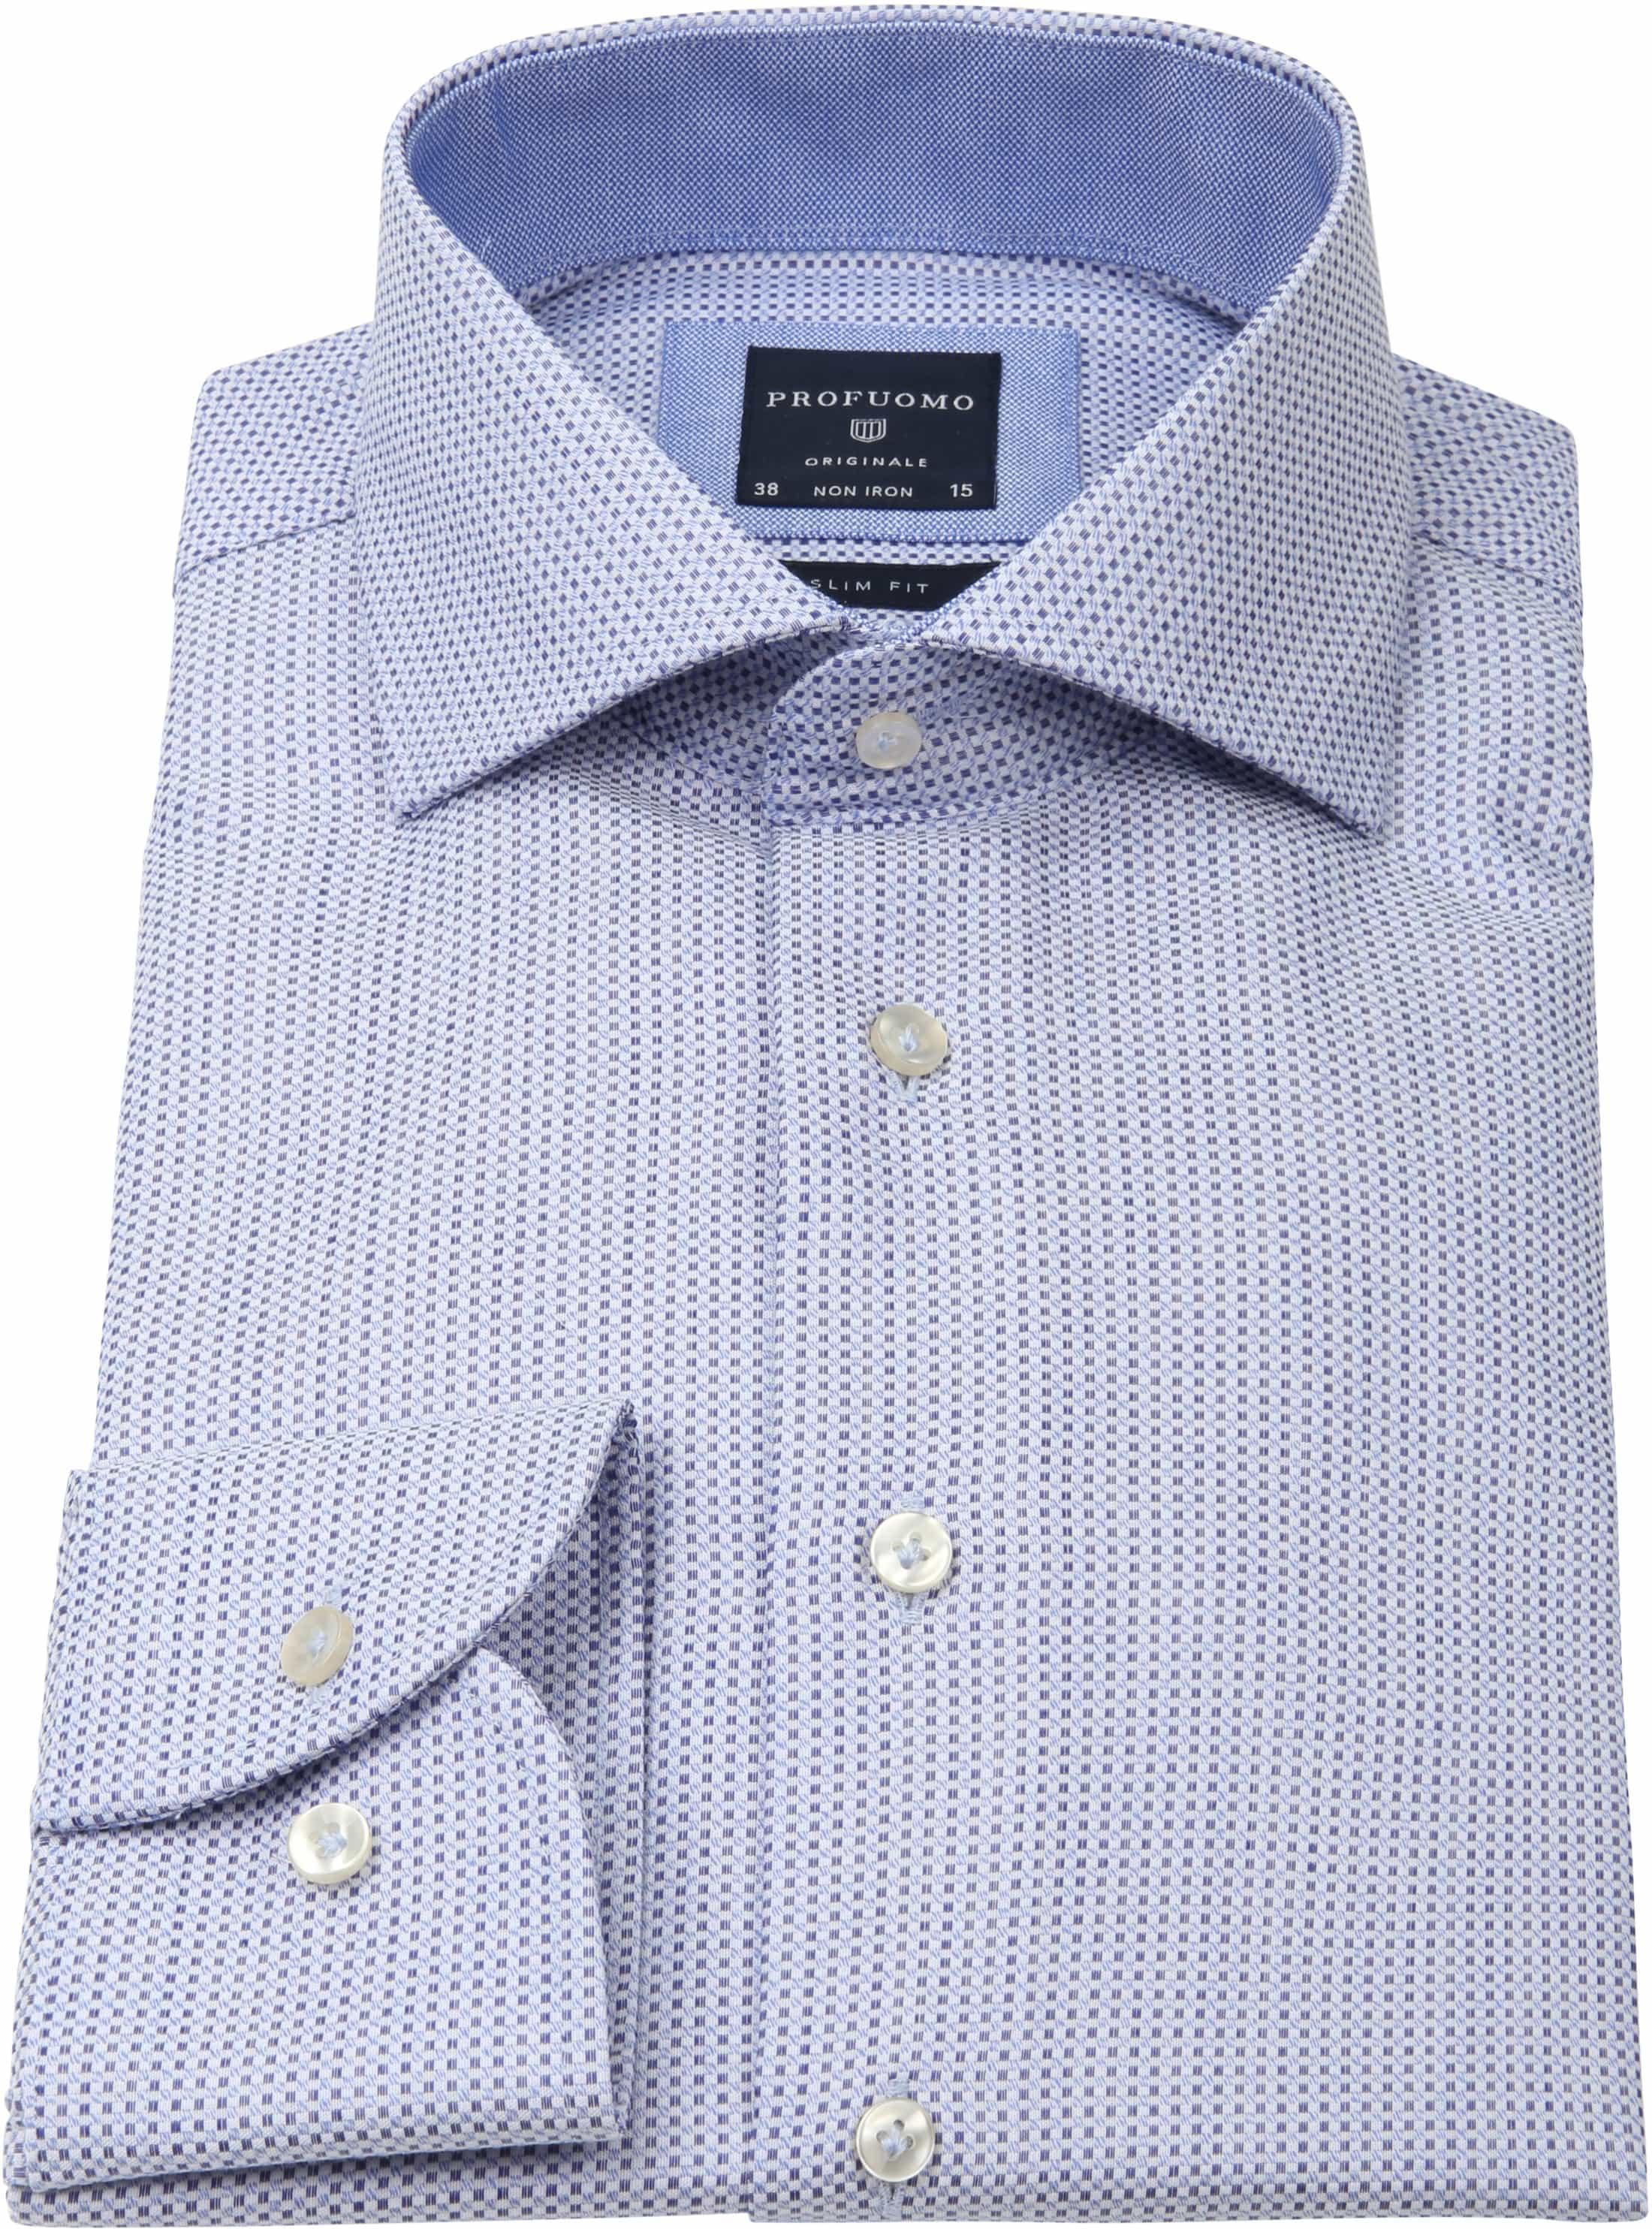 Profuomo Overhemd Slim-Fit Oxfort Blauw foto 2